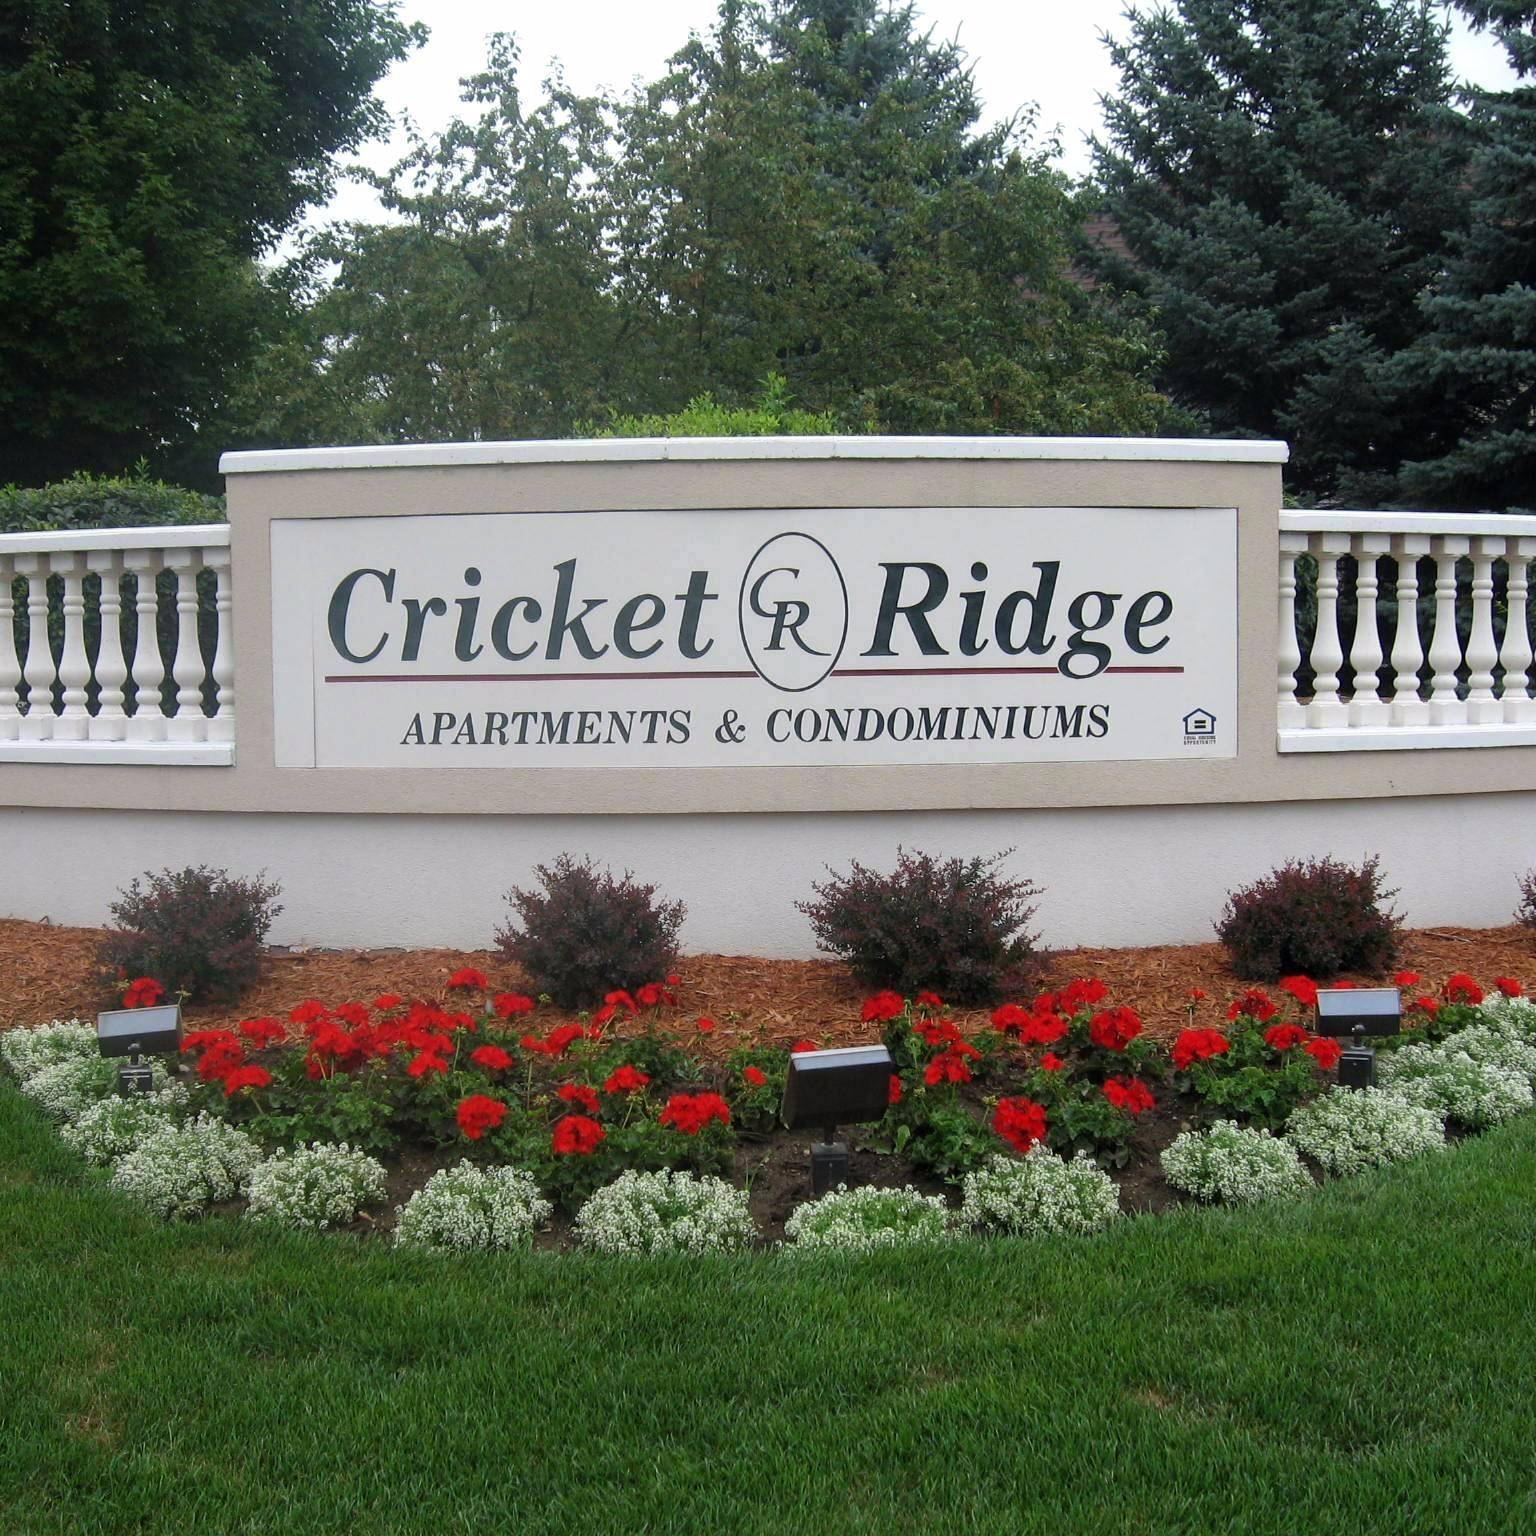 Cricket Ridge Apartments